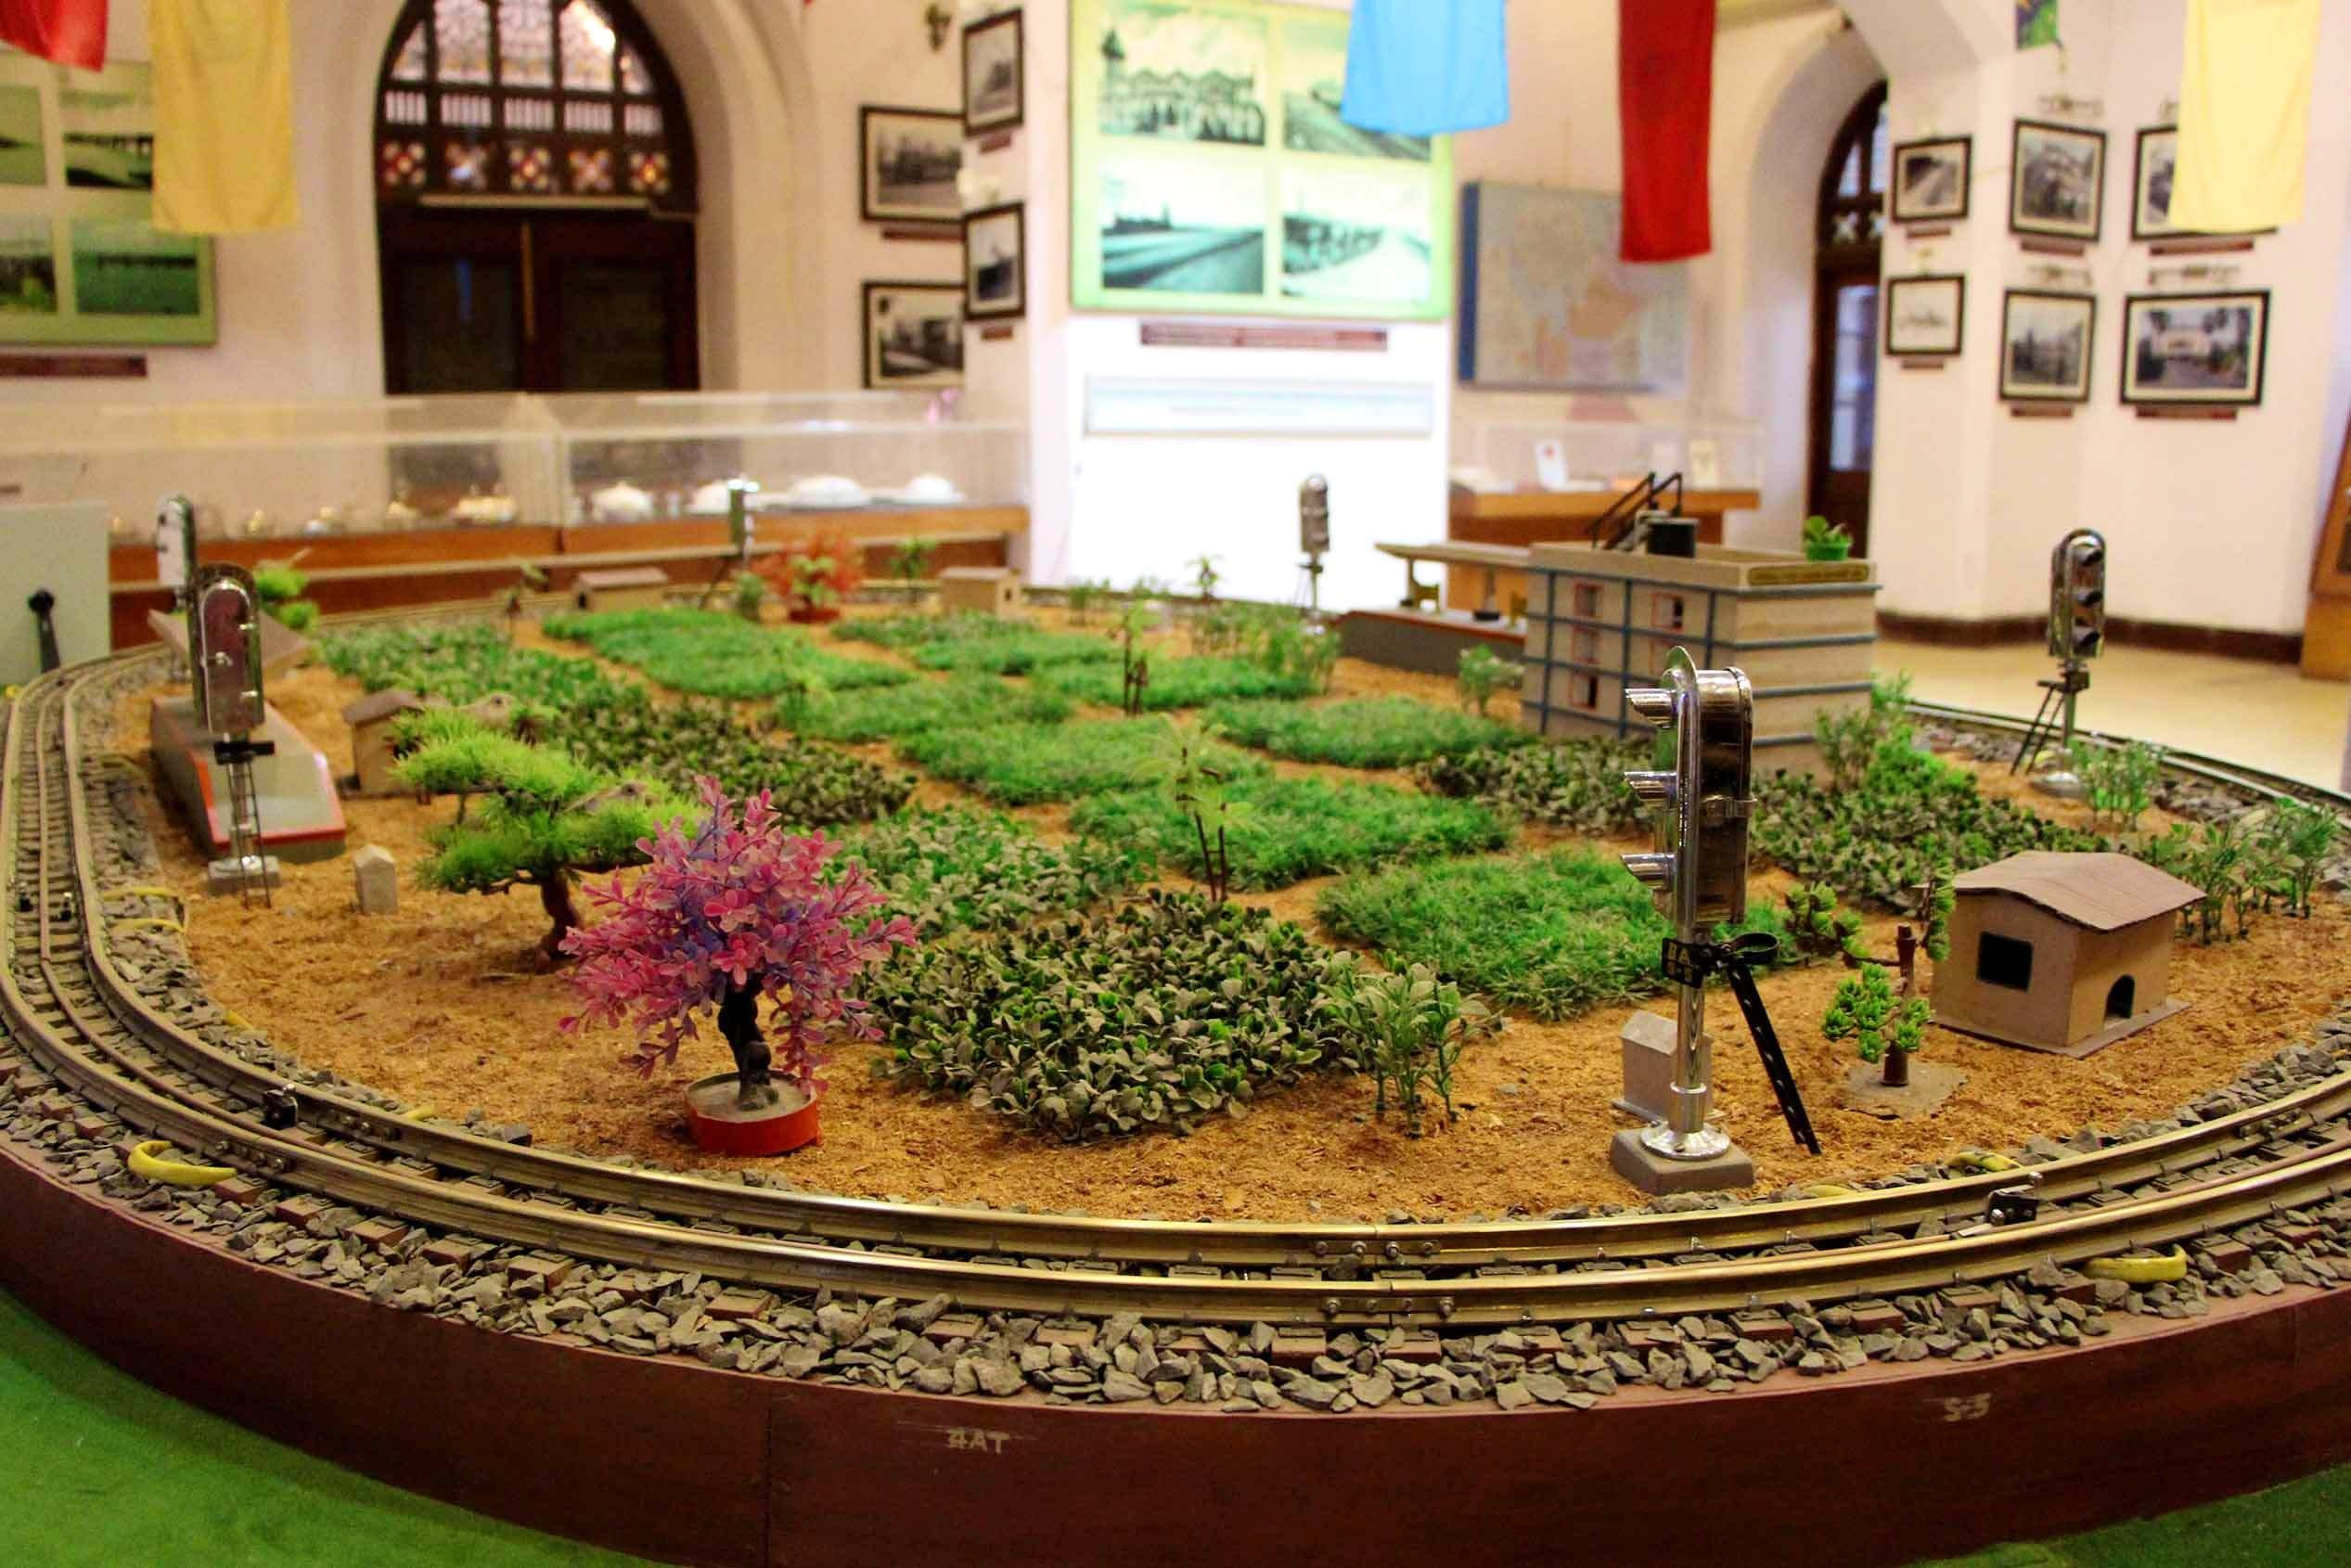 Scale model,Grass,Miniature,Architecture,Garden,Plant,Building,Interior design,Courtyard,Houseplant